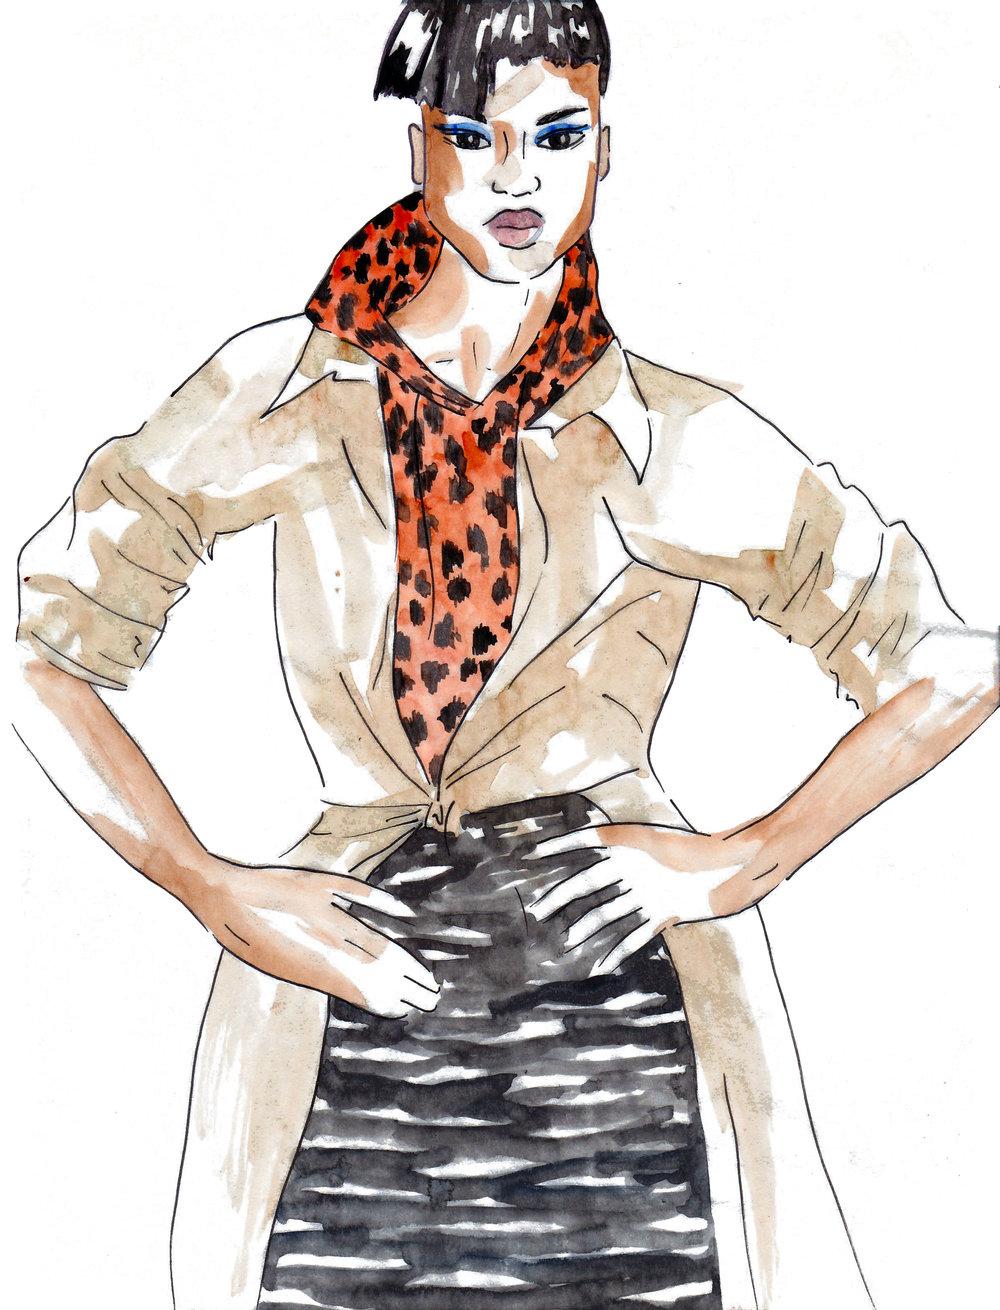 ashleychase fashionillustration watercolor.jpg